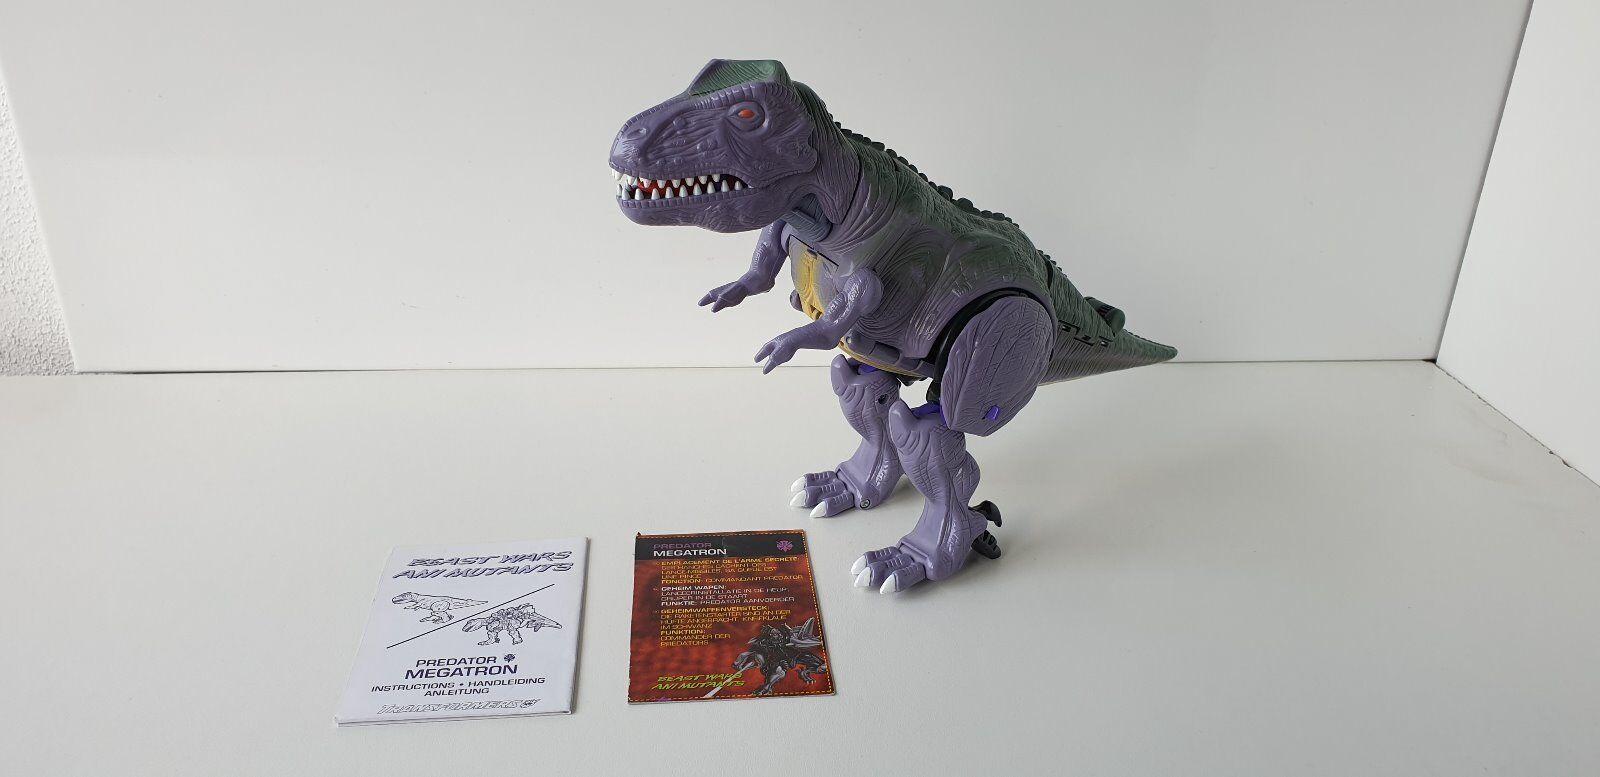 Transformers Beast Wars Megatron  Hasbro 1997 Ultra Class Predacon Predacon Predacon T-Rex  100% afcaf9